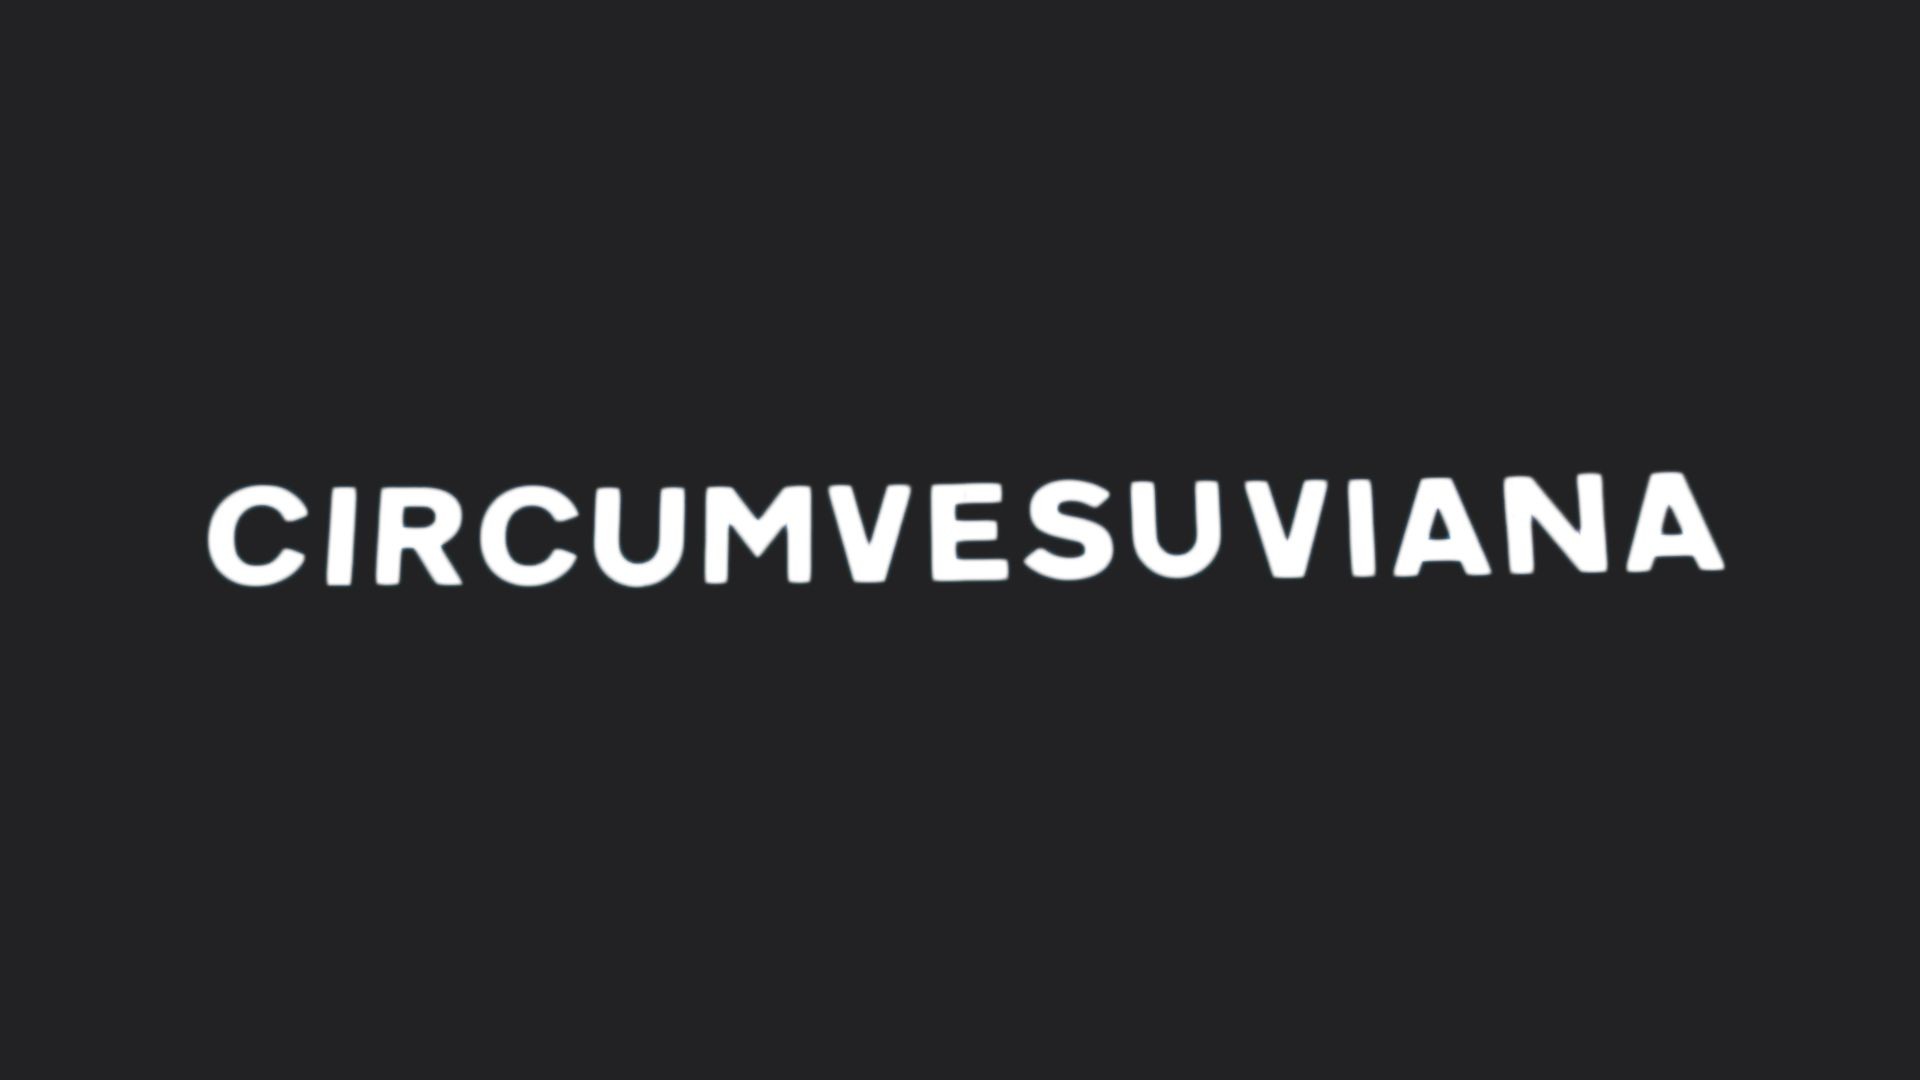 Circumvesuviana - Documentaire (2018)